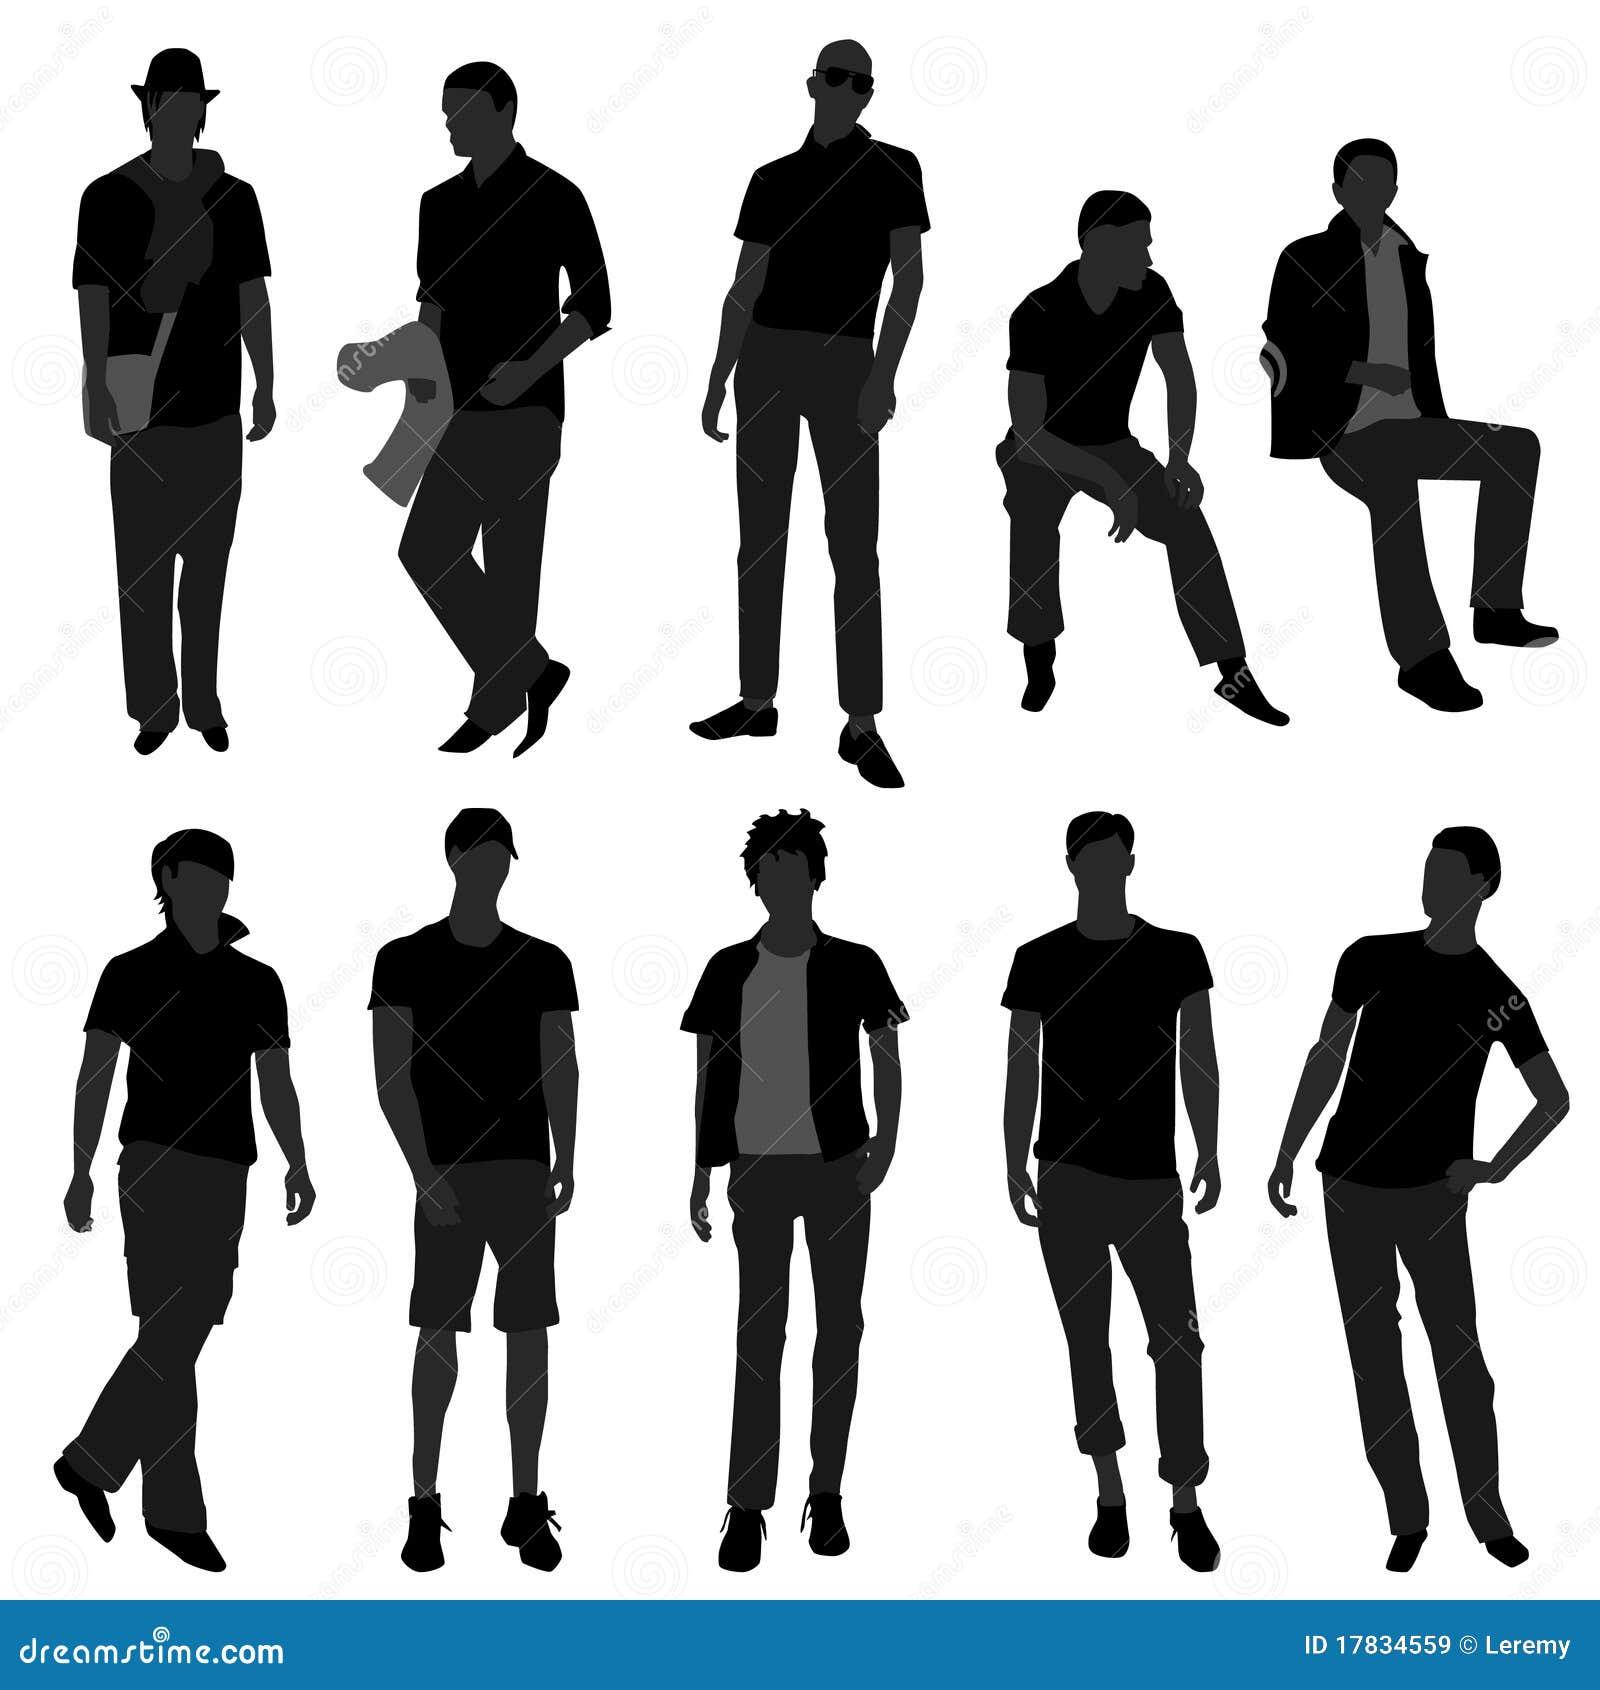 Modern dress 0 3 - Man Men Male Fashion Shopping Model Royalty Free Stock Images Image